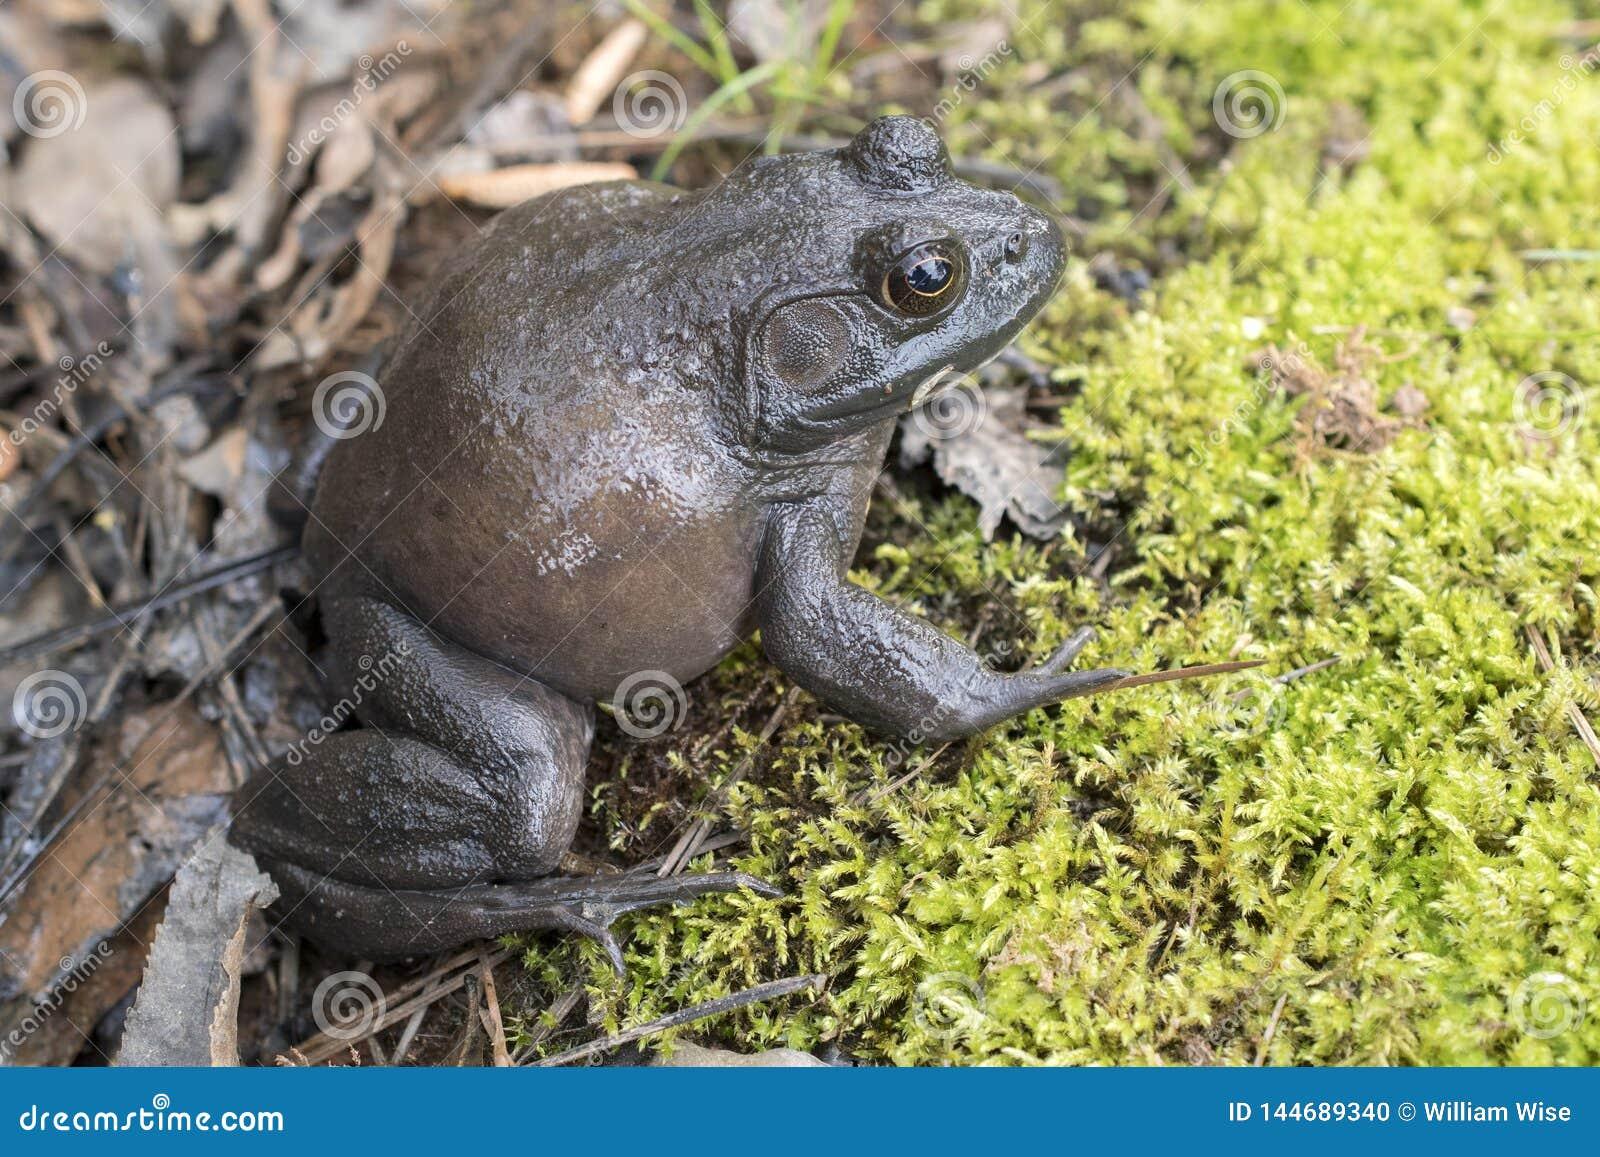 Giant American Bullfrog, Georgia